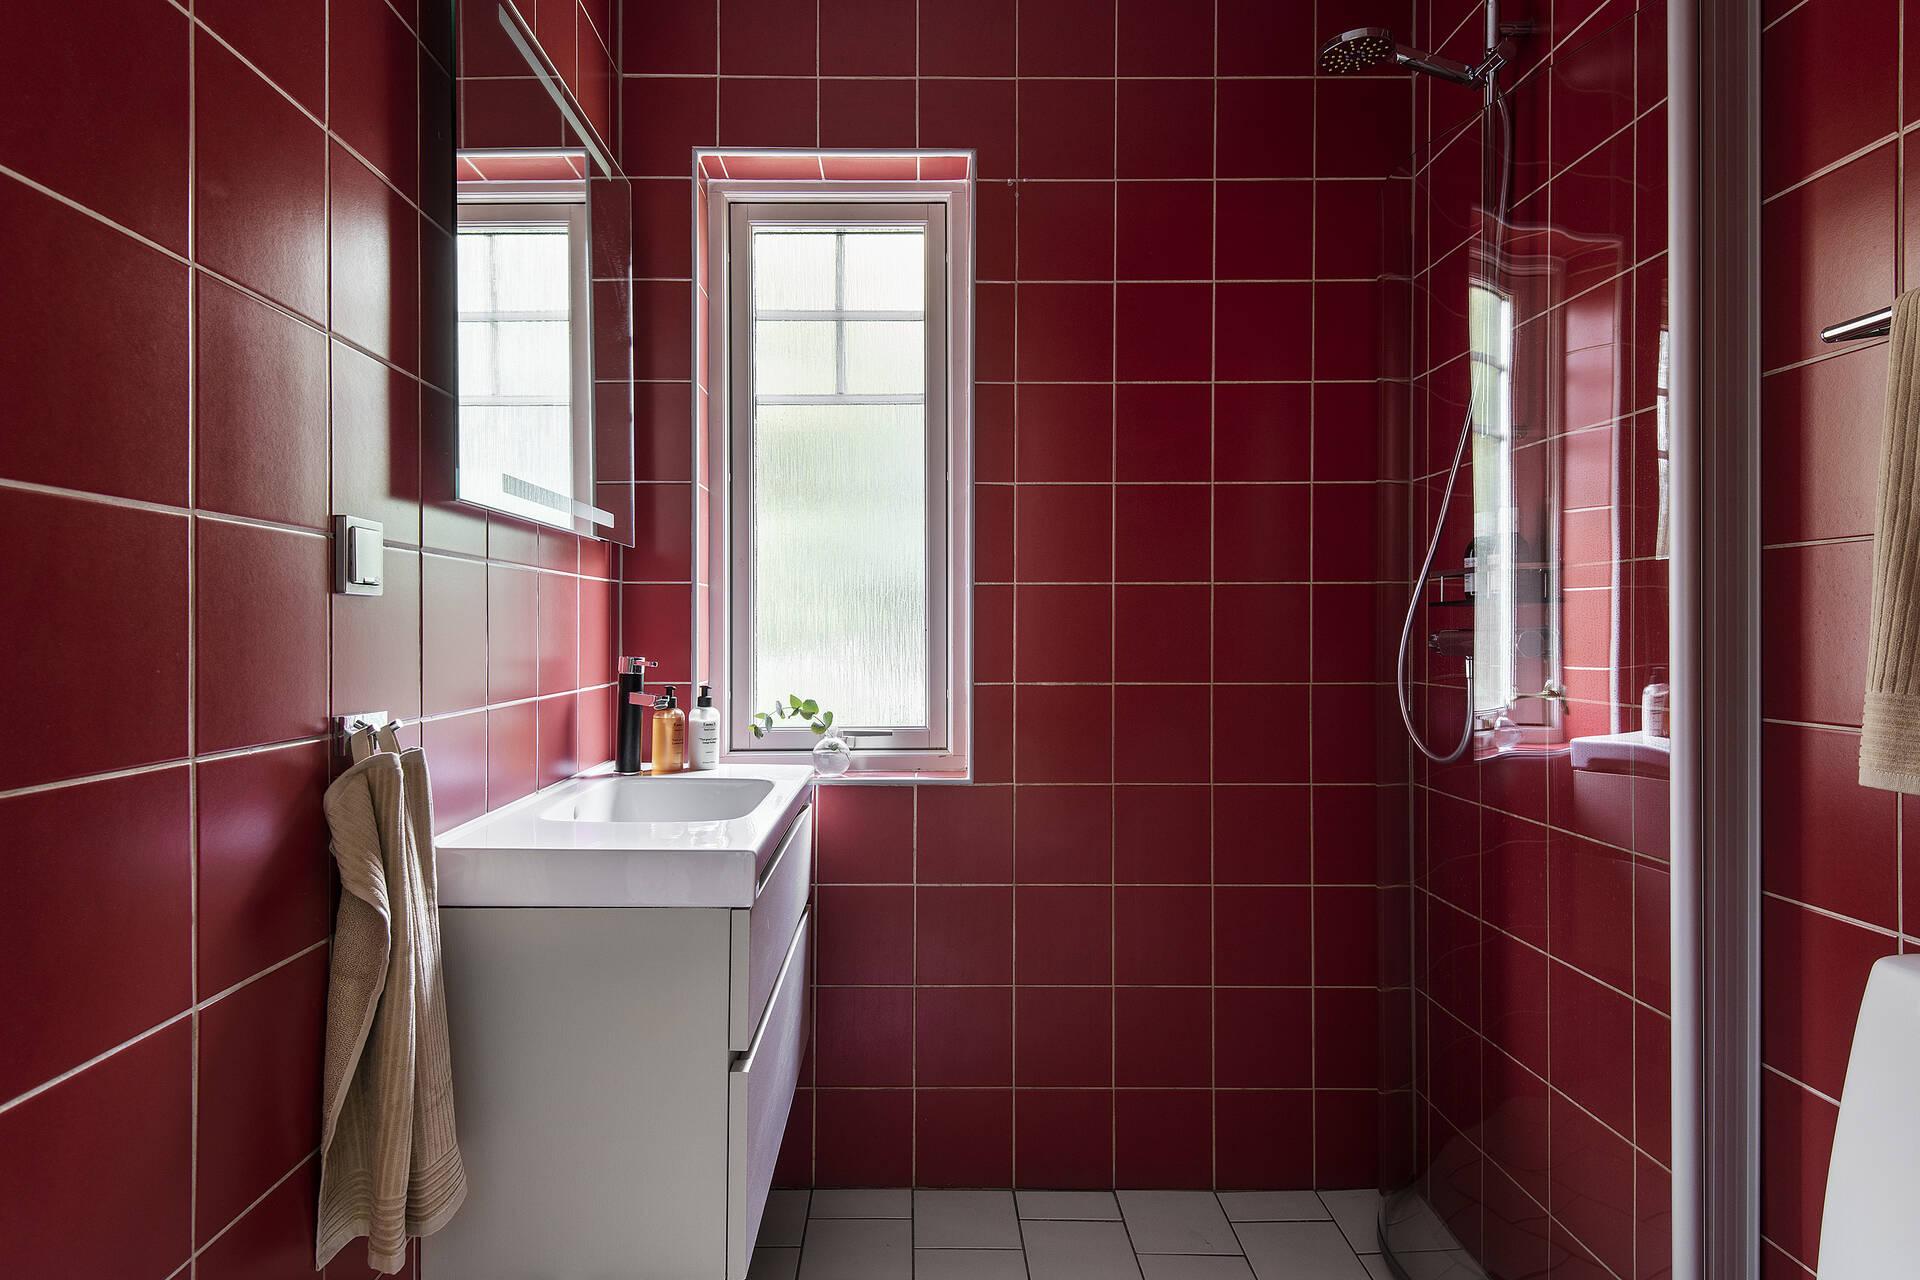 Badrum nedre-  eller övreplan?